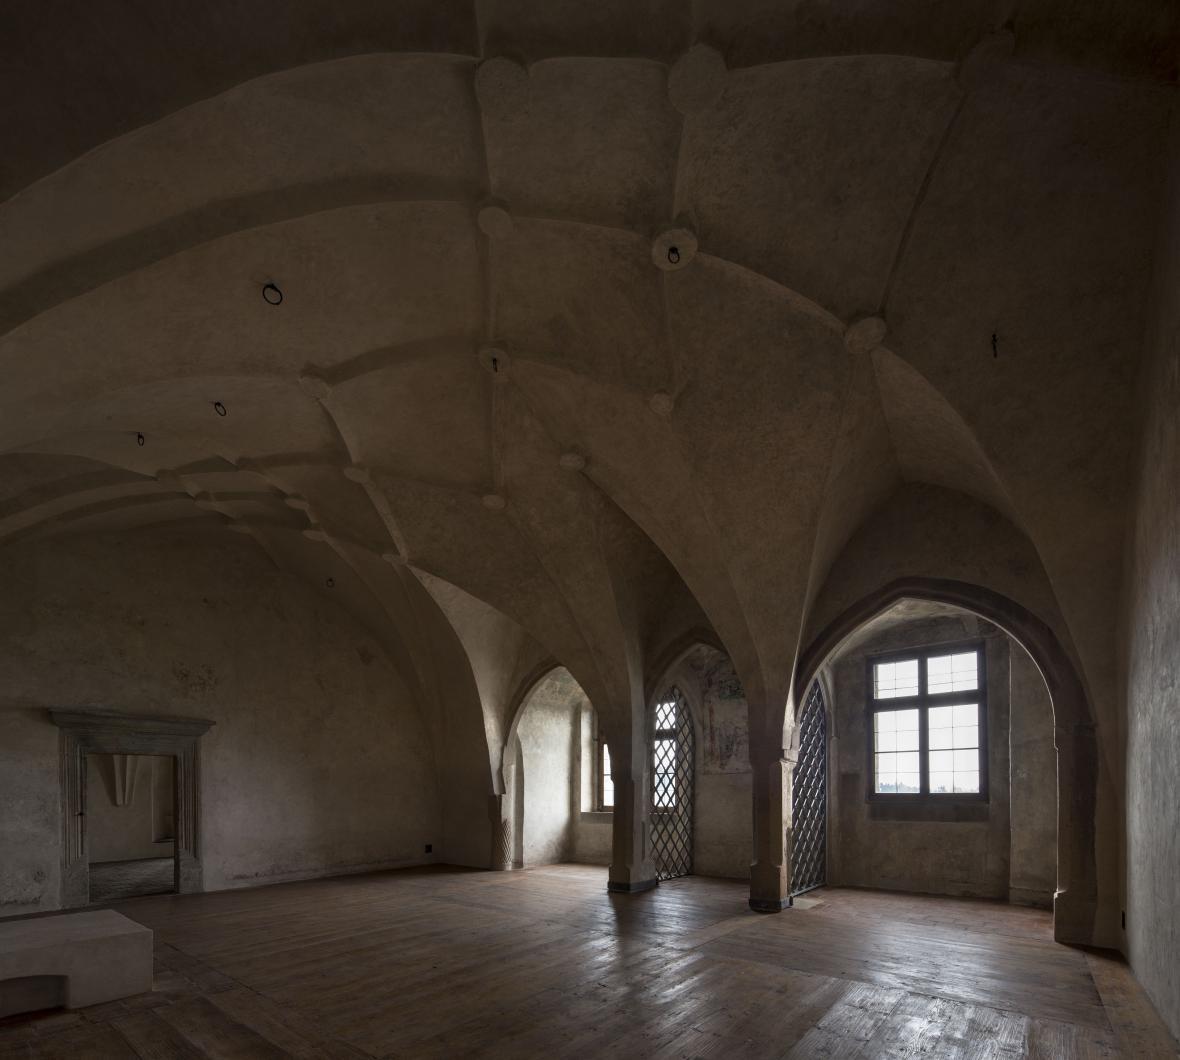 Obnova interiéru hradu Lipnice nad Sázavou